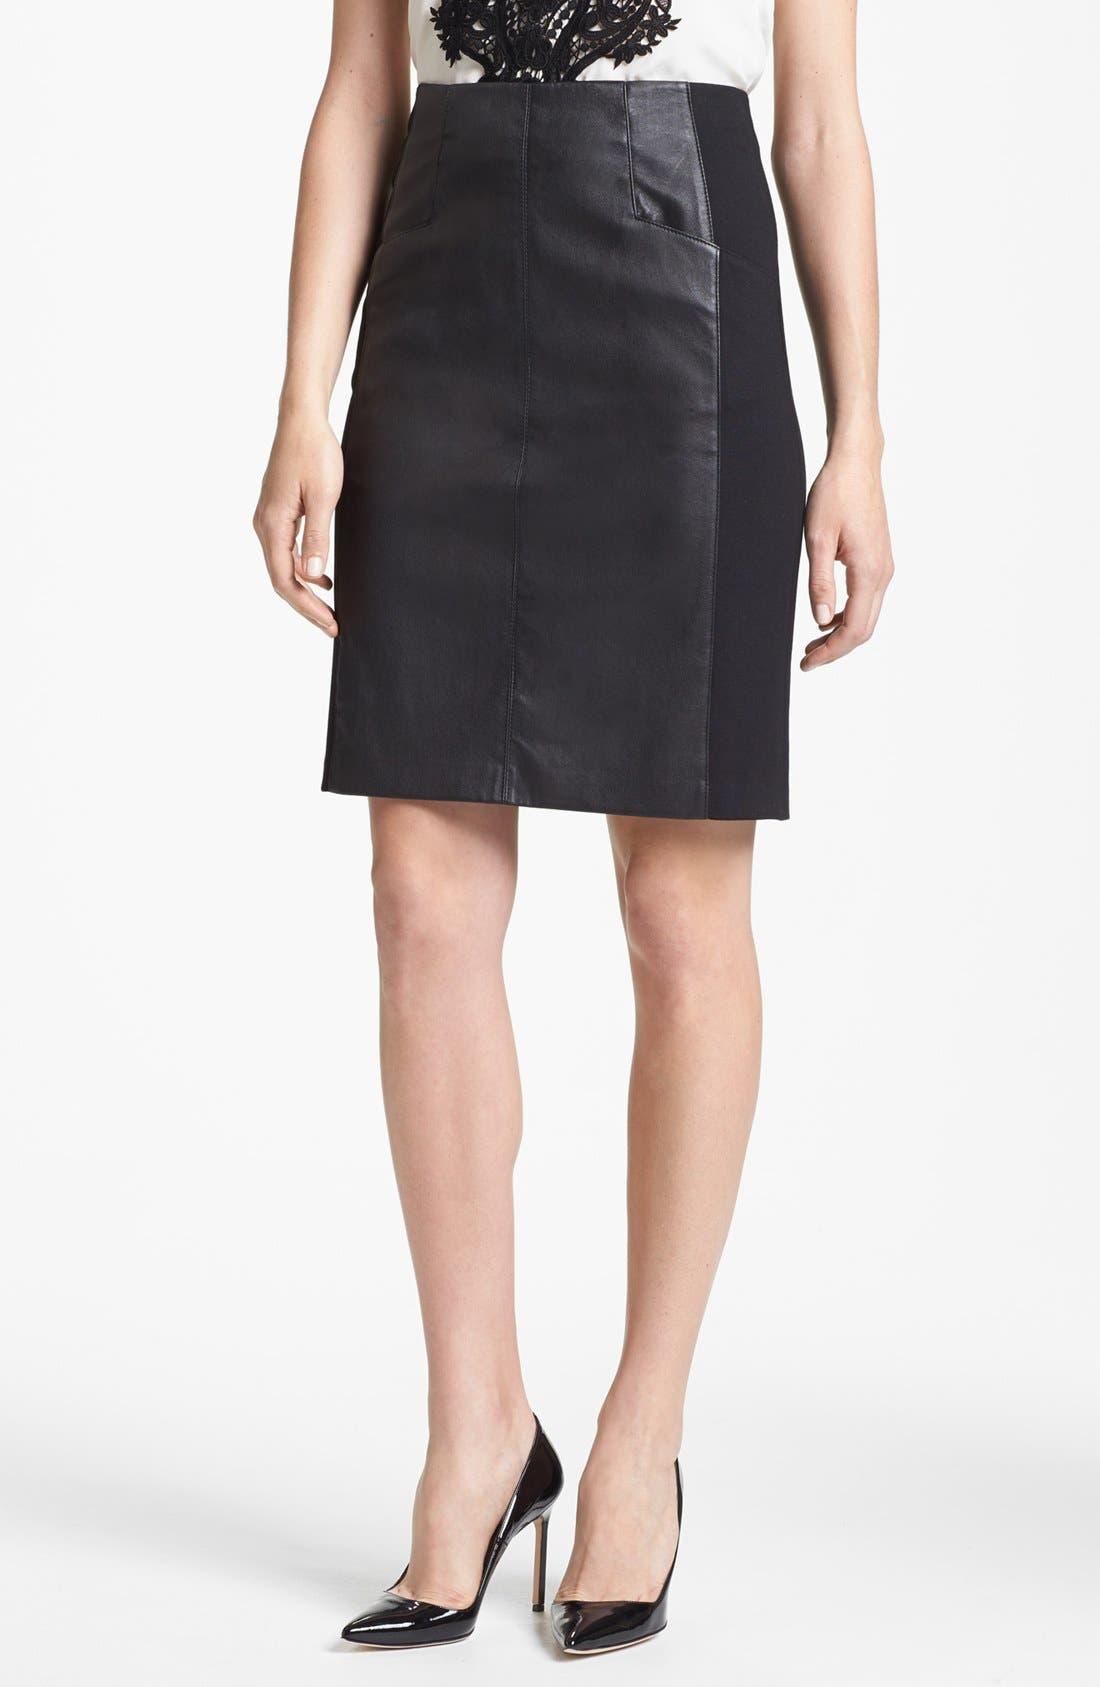 Alternate Image 1 Selected - Nanette Lepore 'Mime' Leather & Knit Skirt